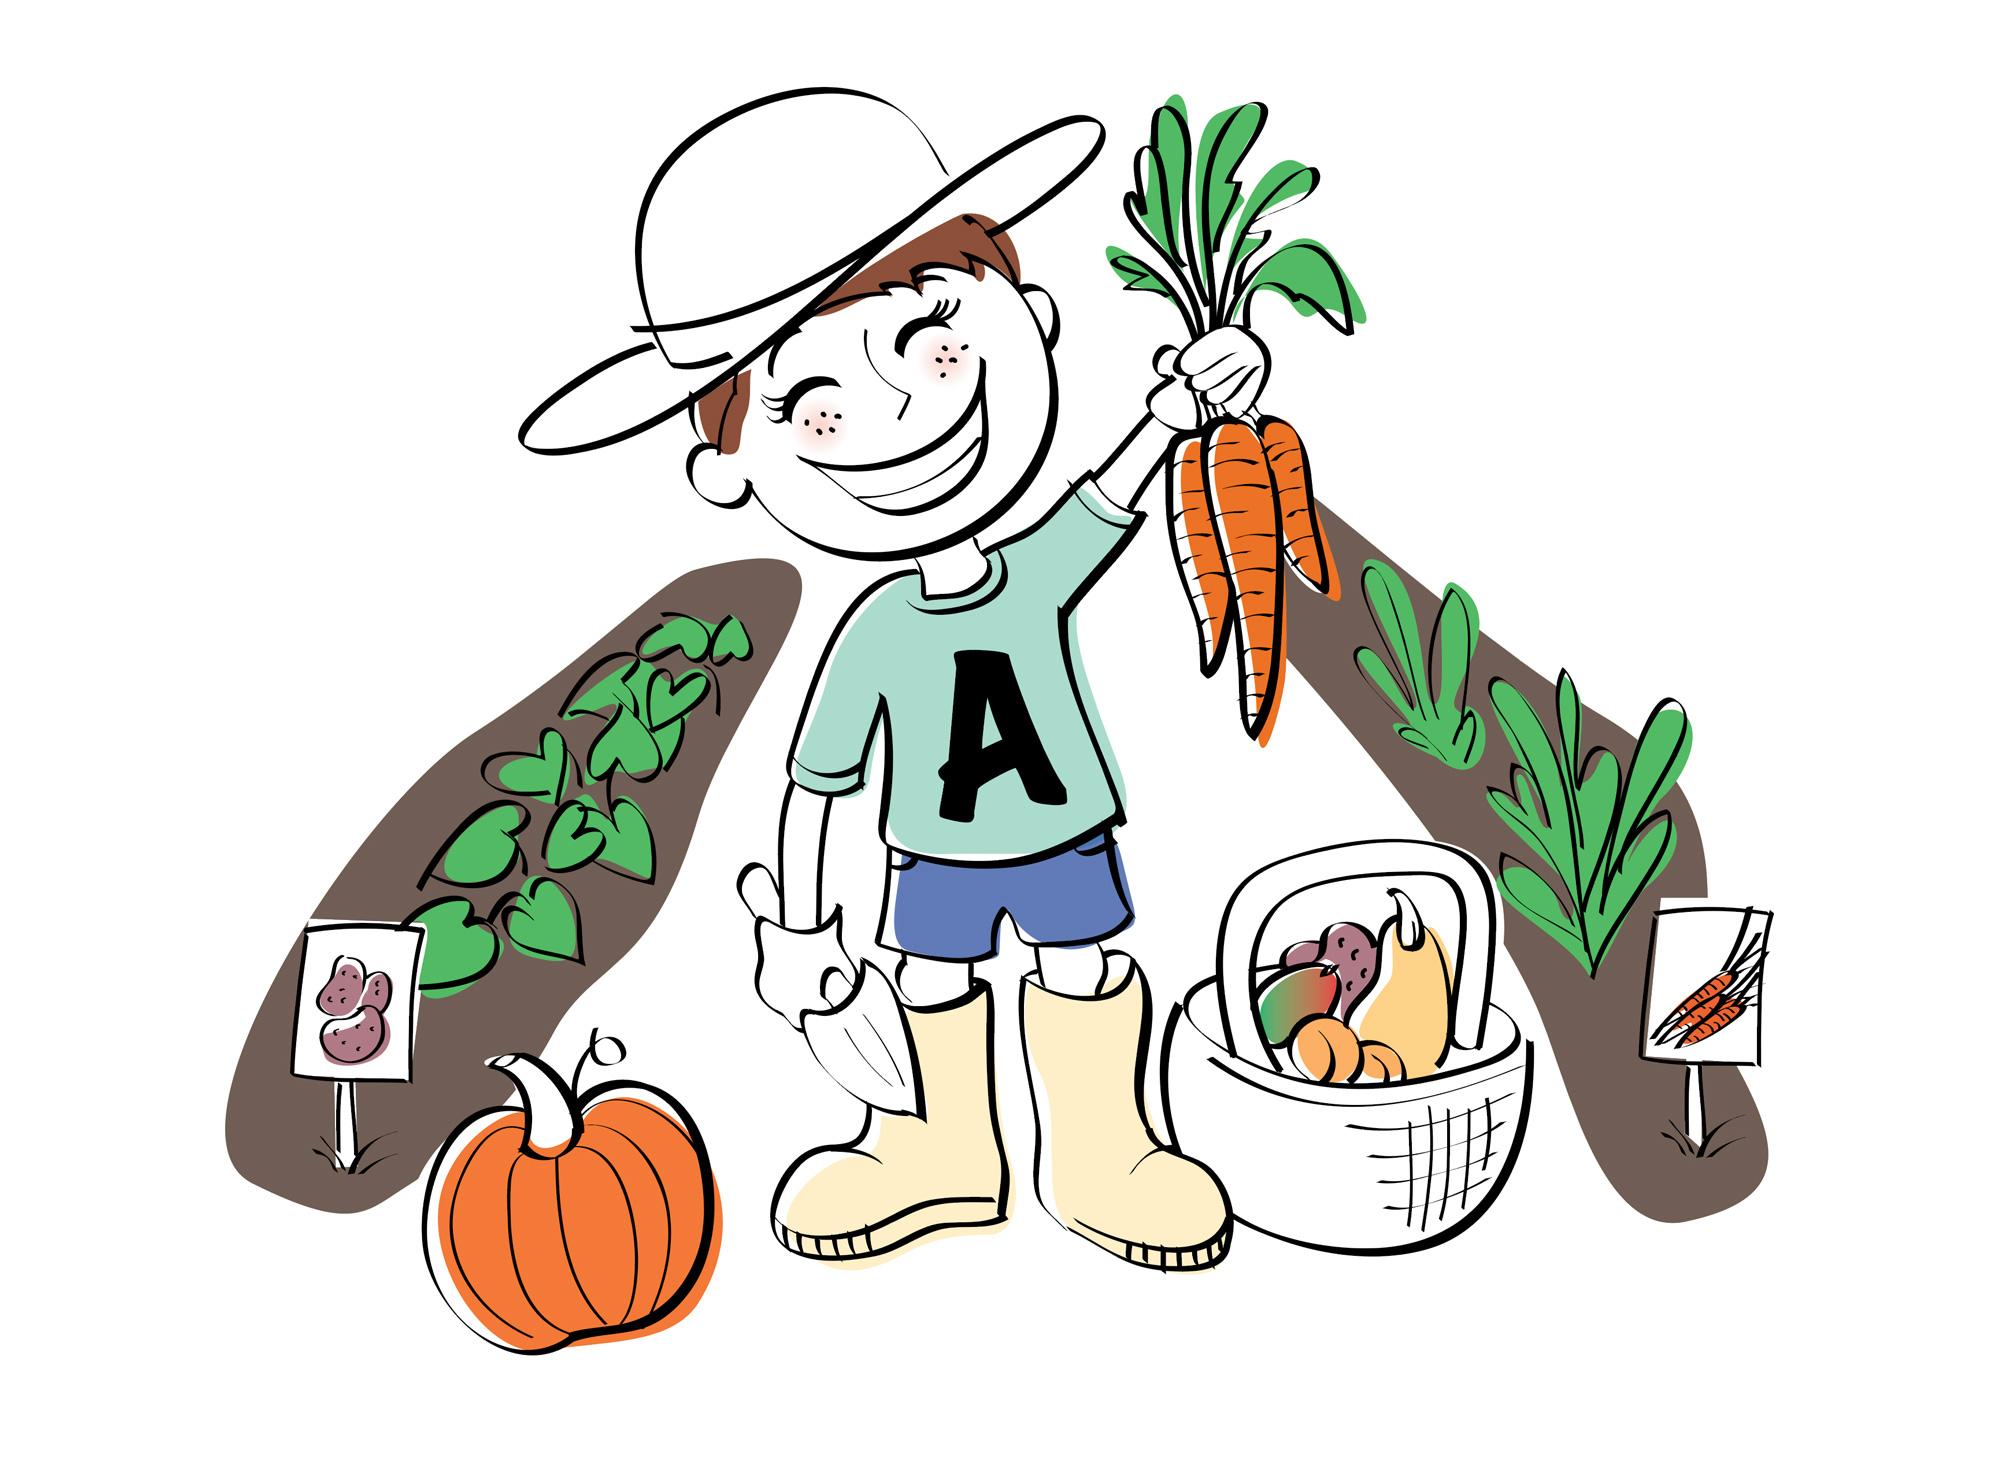 Vitamin C child gardener